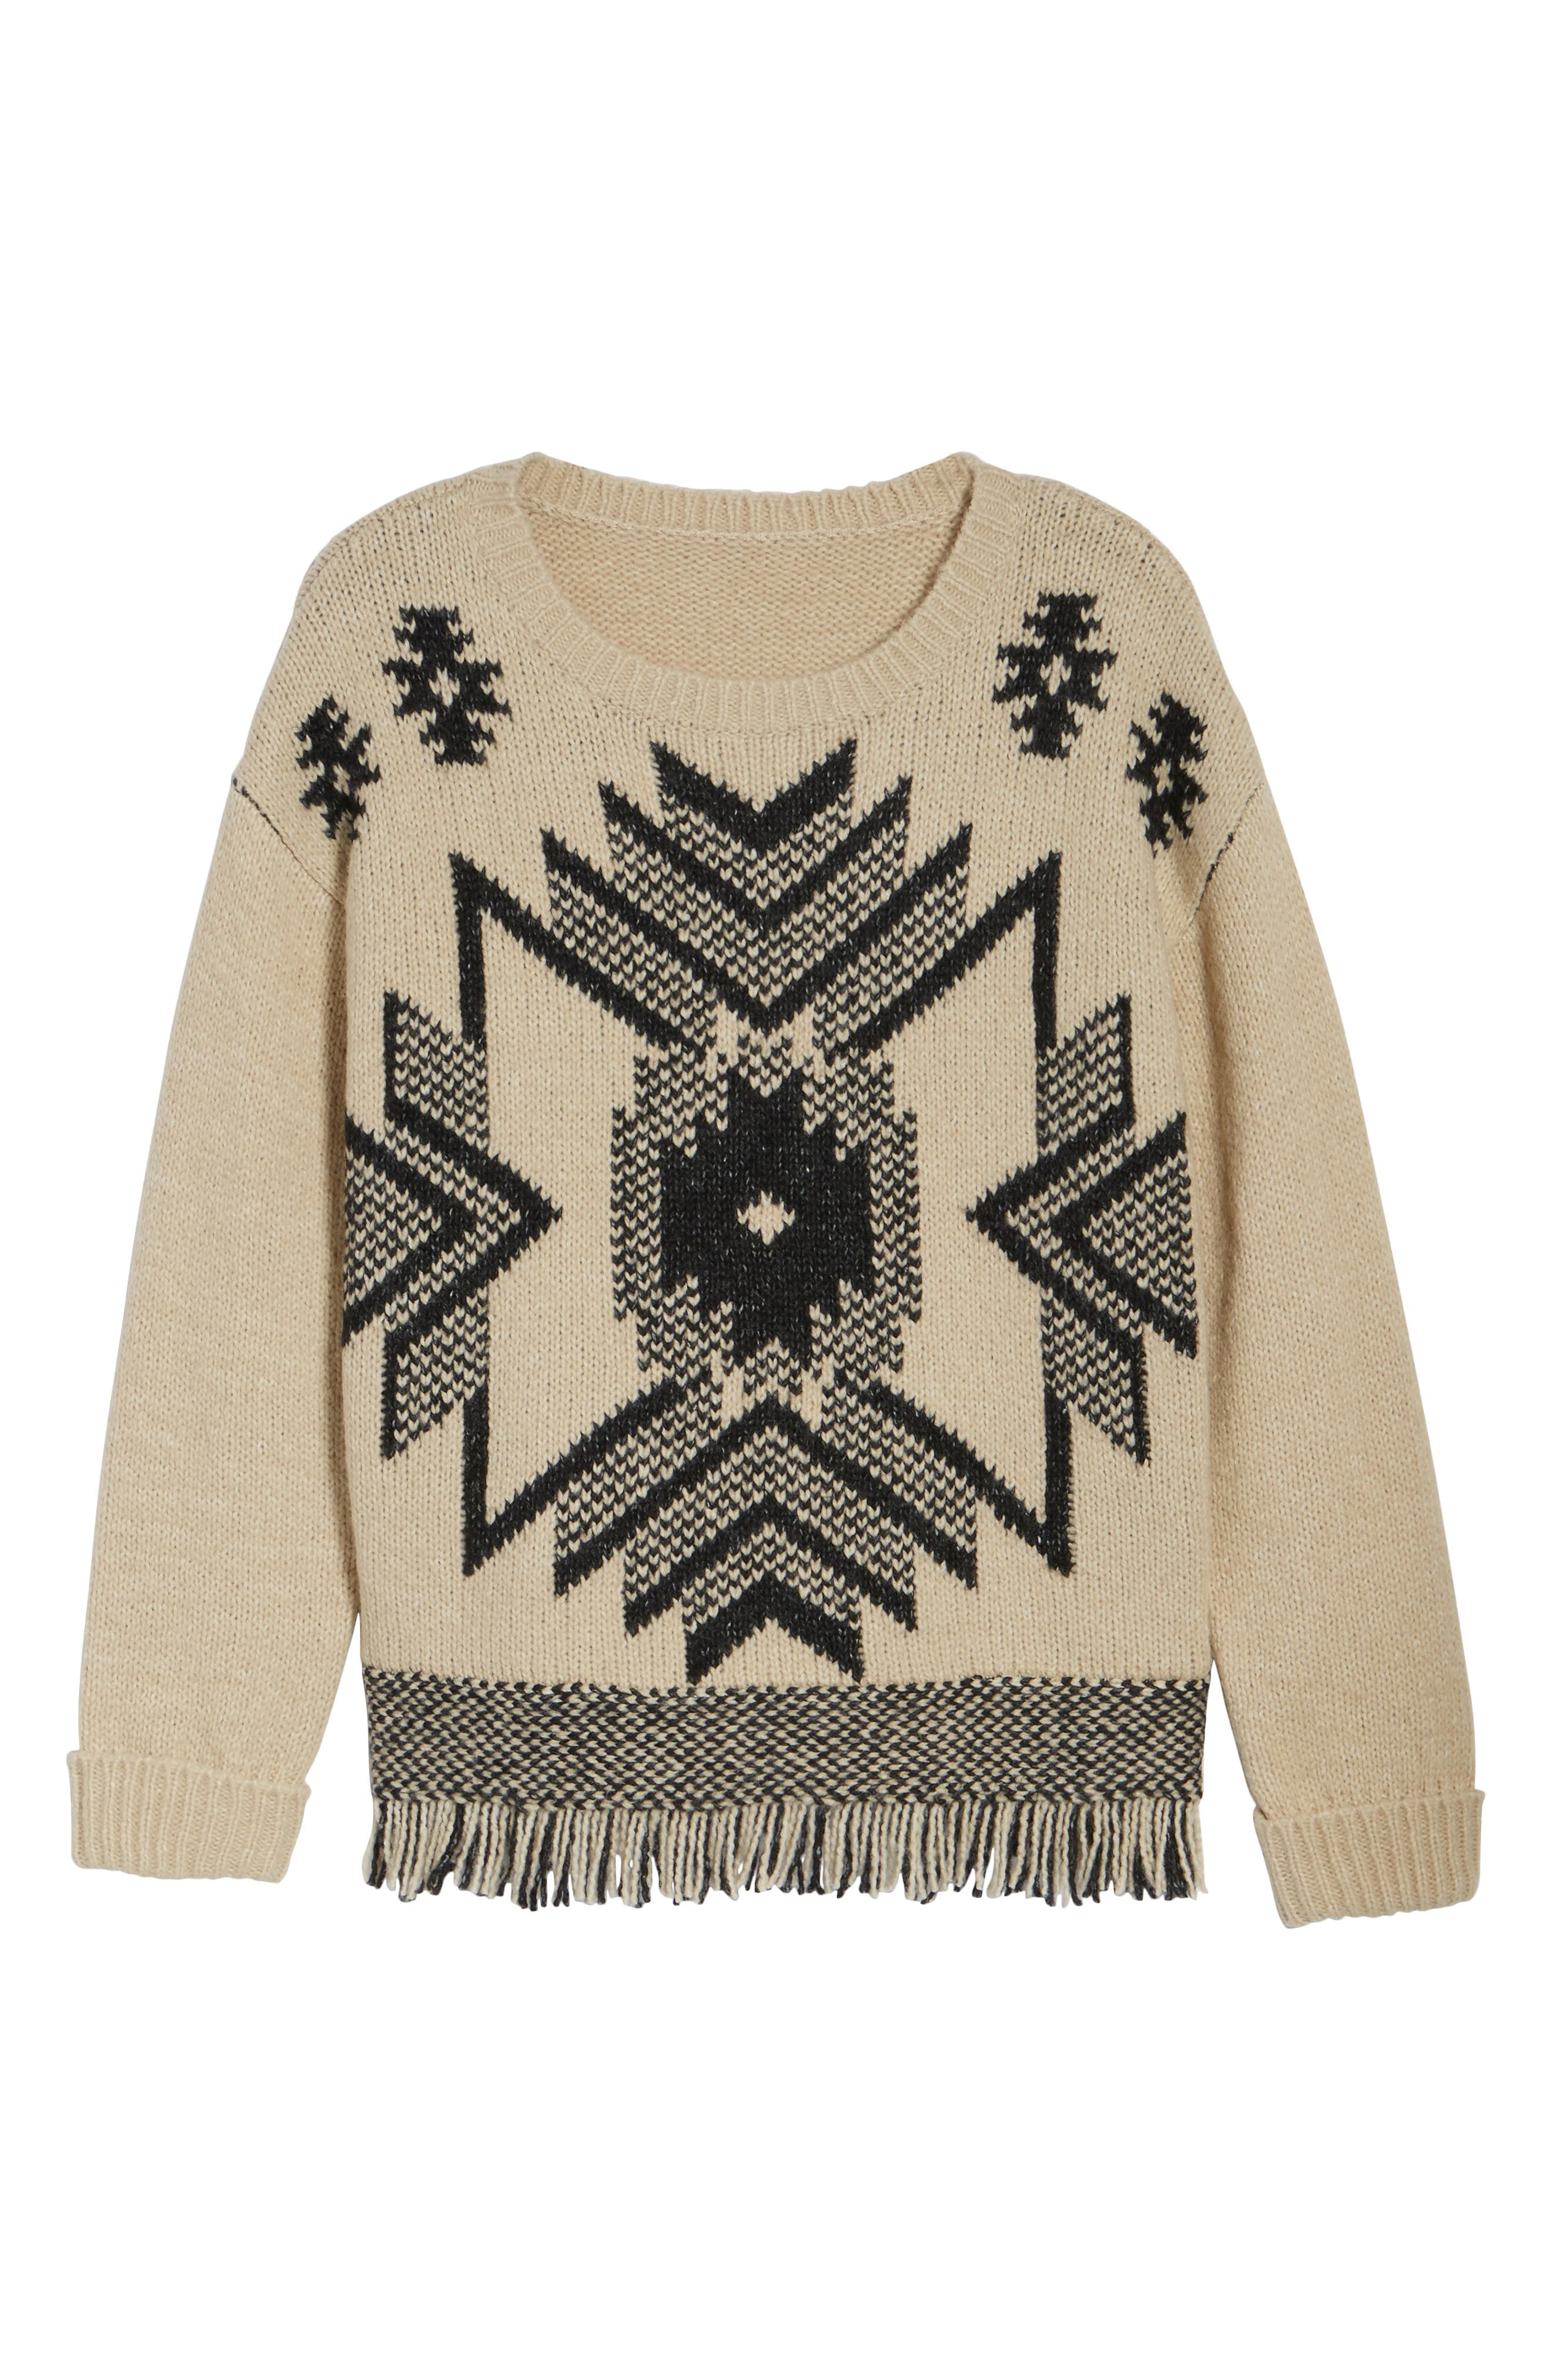 Fringe Sweater,                             Alternate thumbnail 6, color,                             Husked Tan